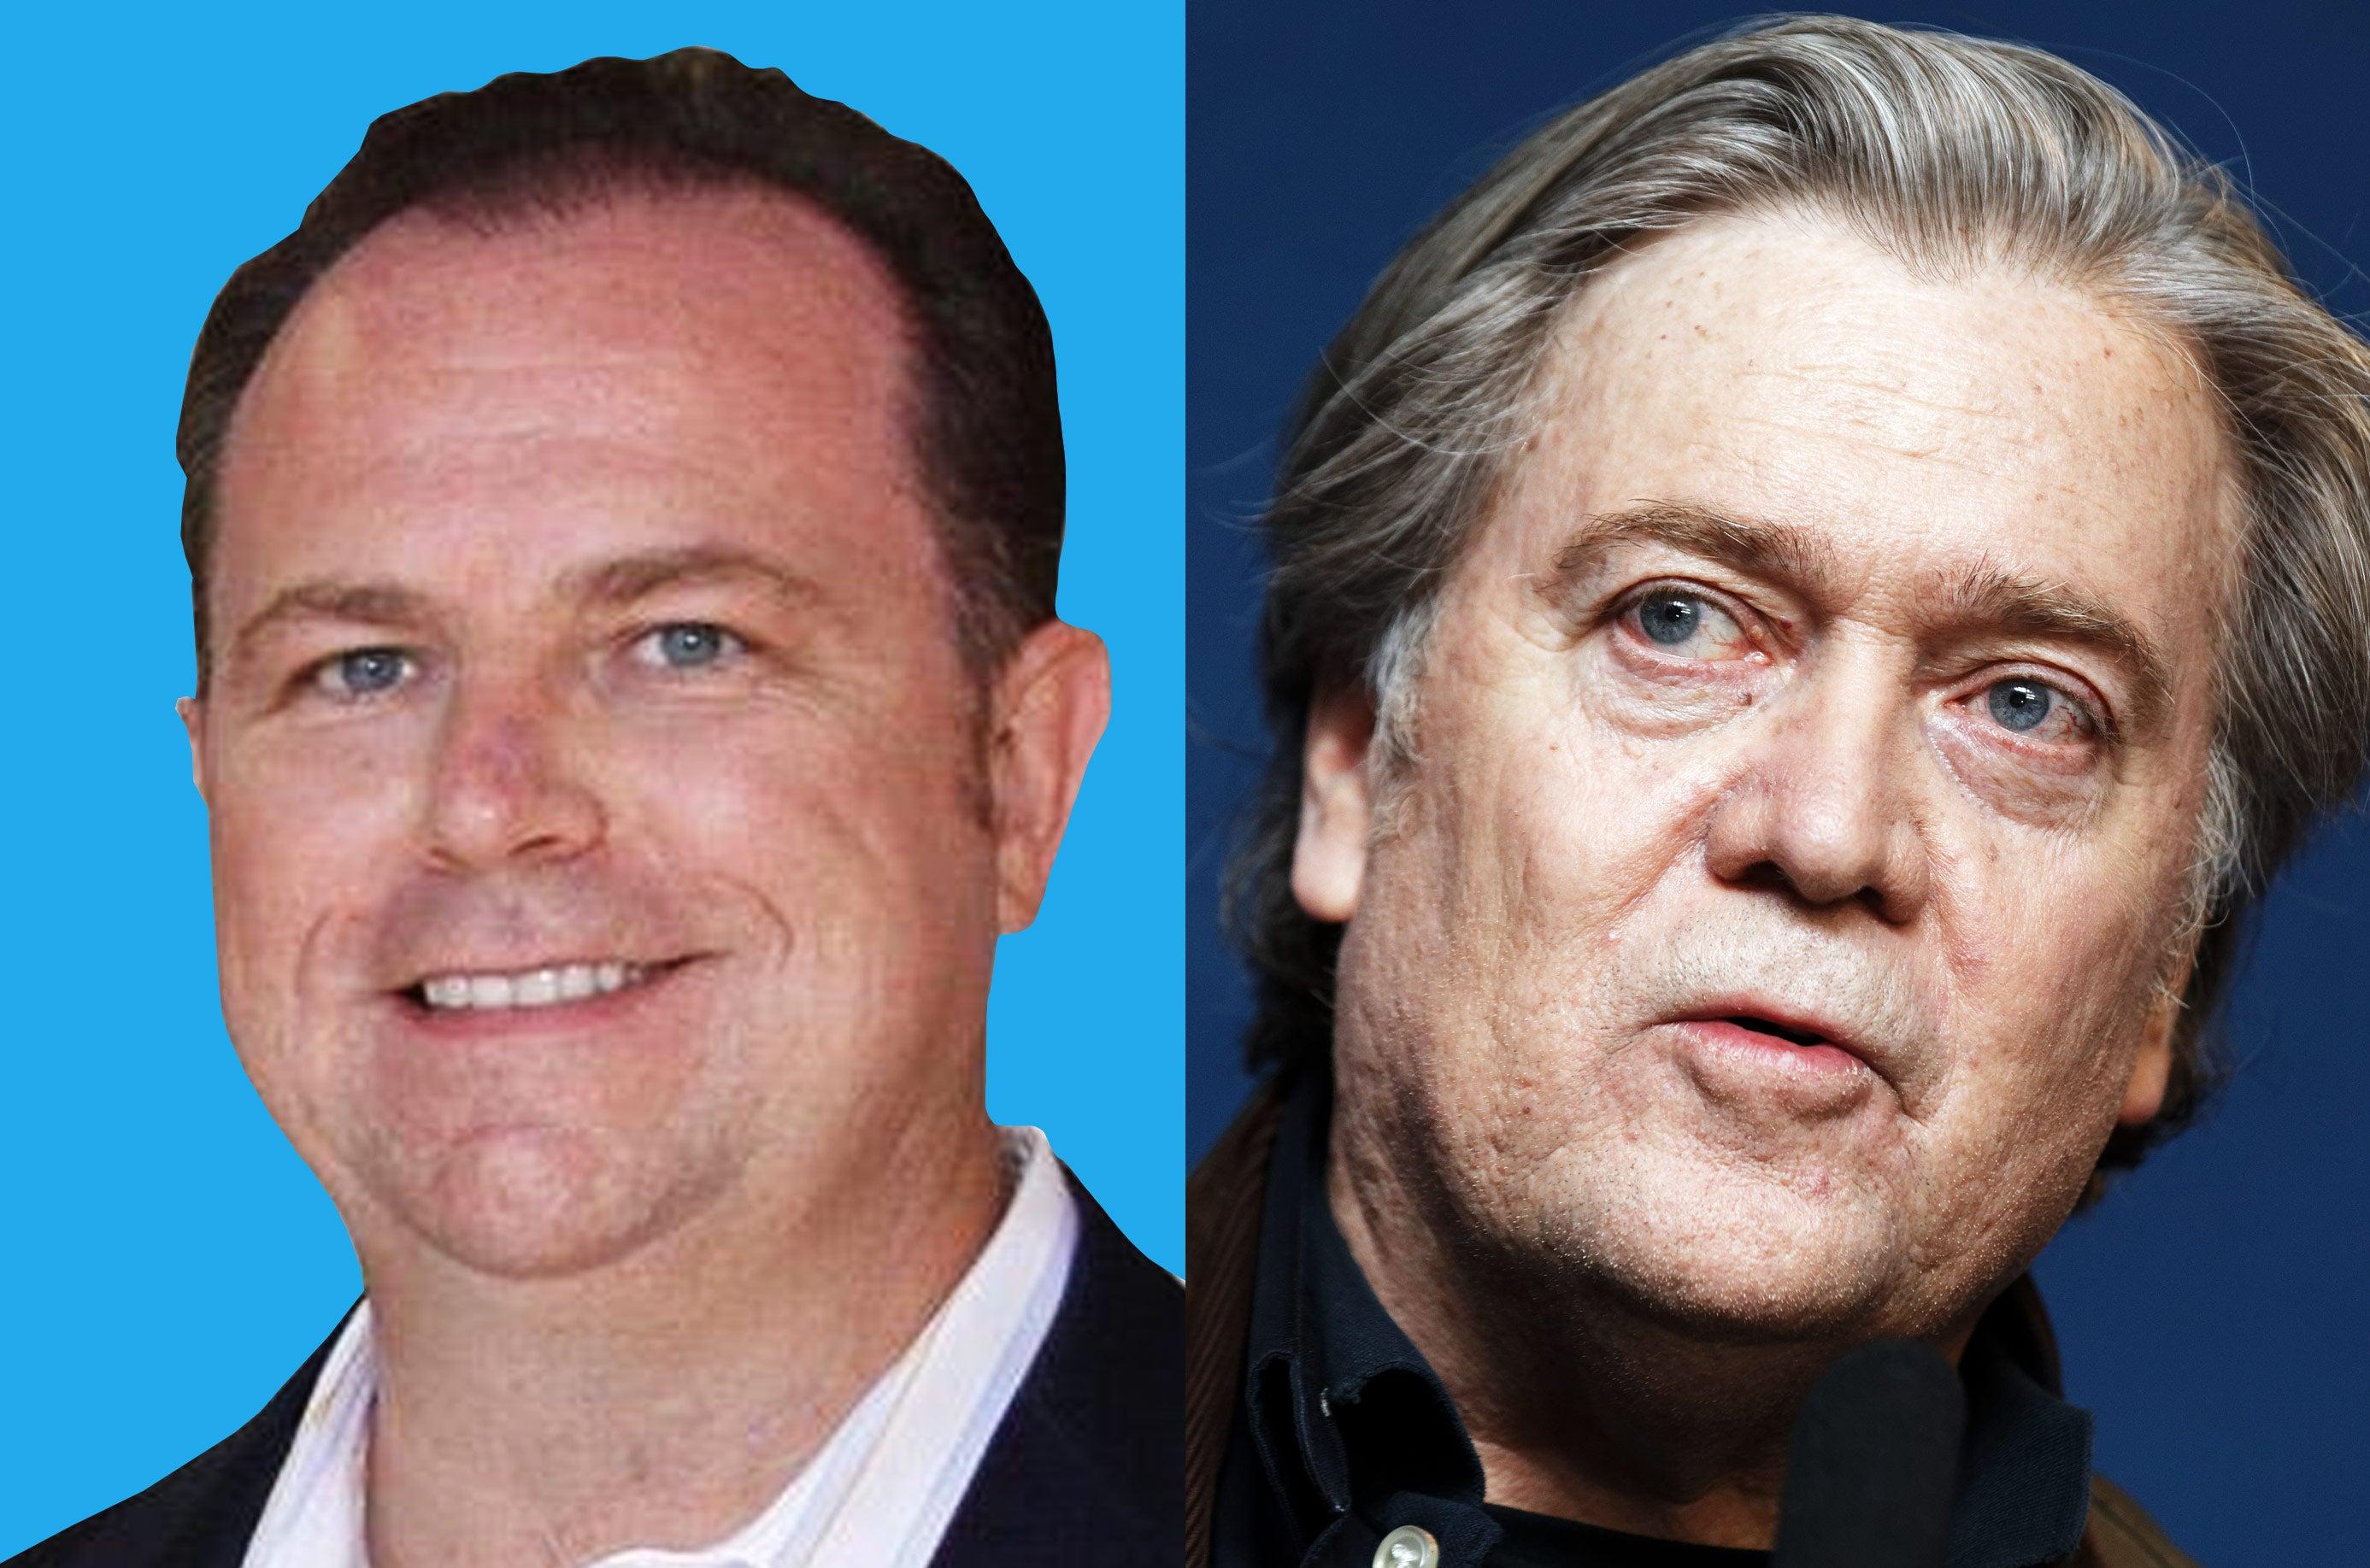 Newsmax CEO Christopher Ruddy and former presidential advisor Steve Bannon.